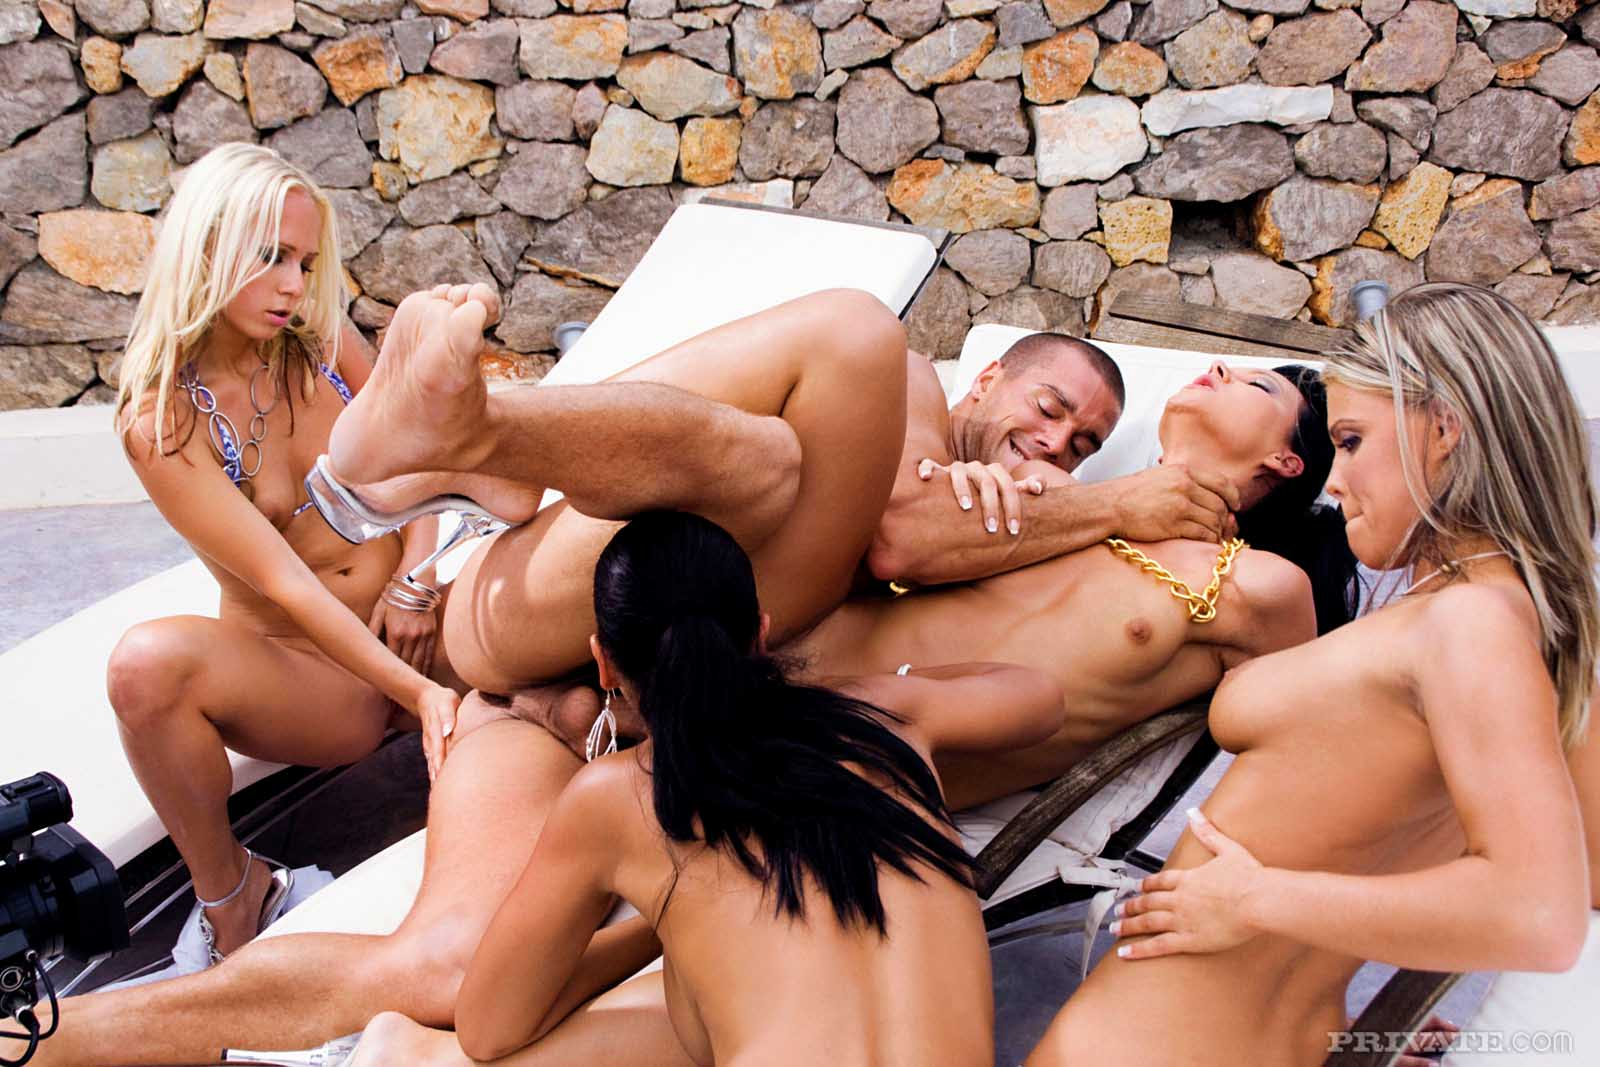 Private sex party porn